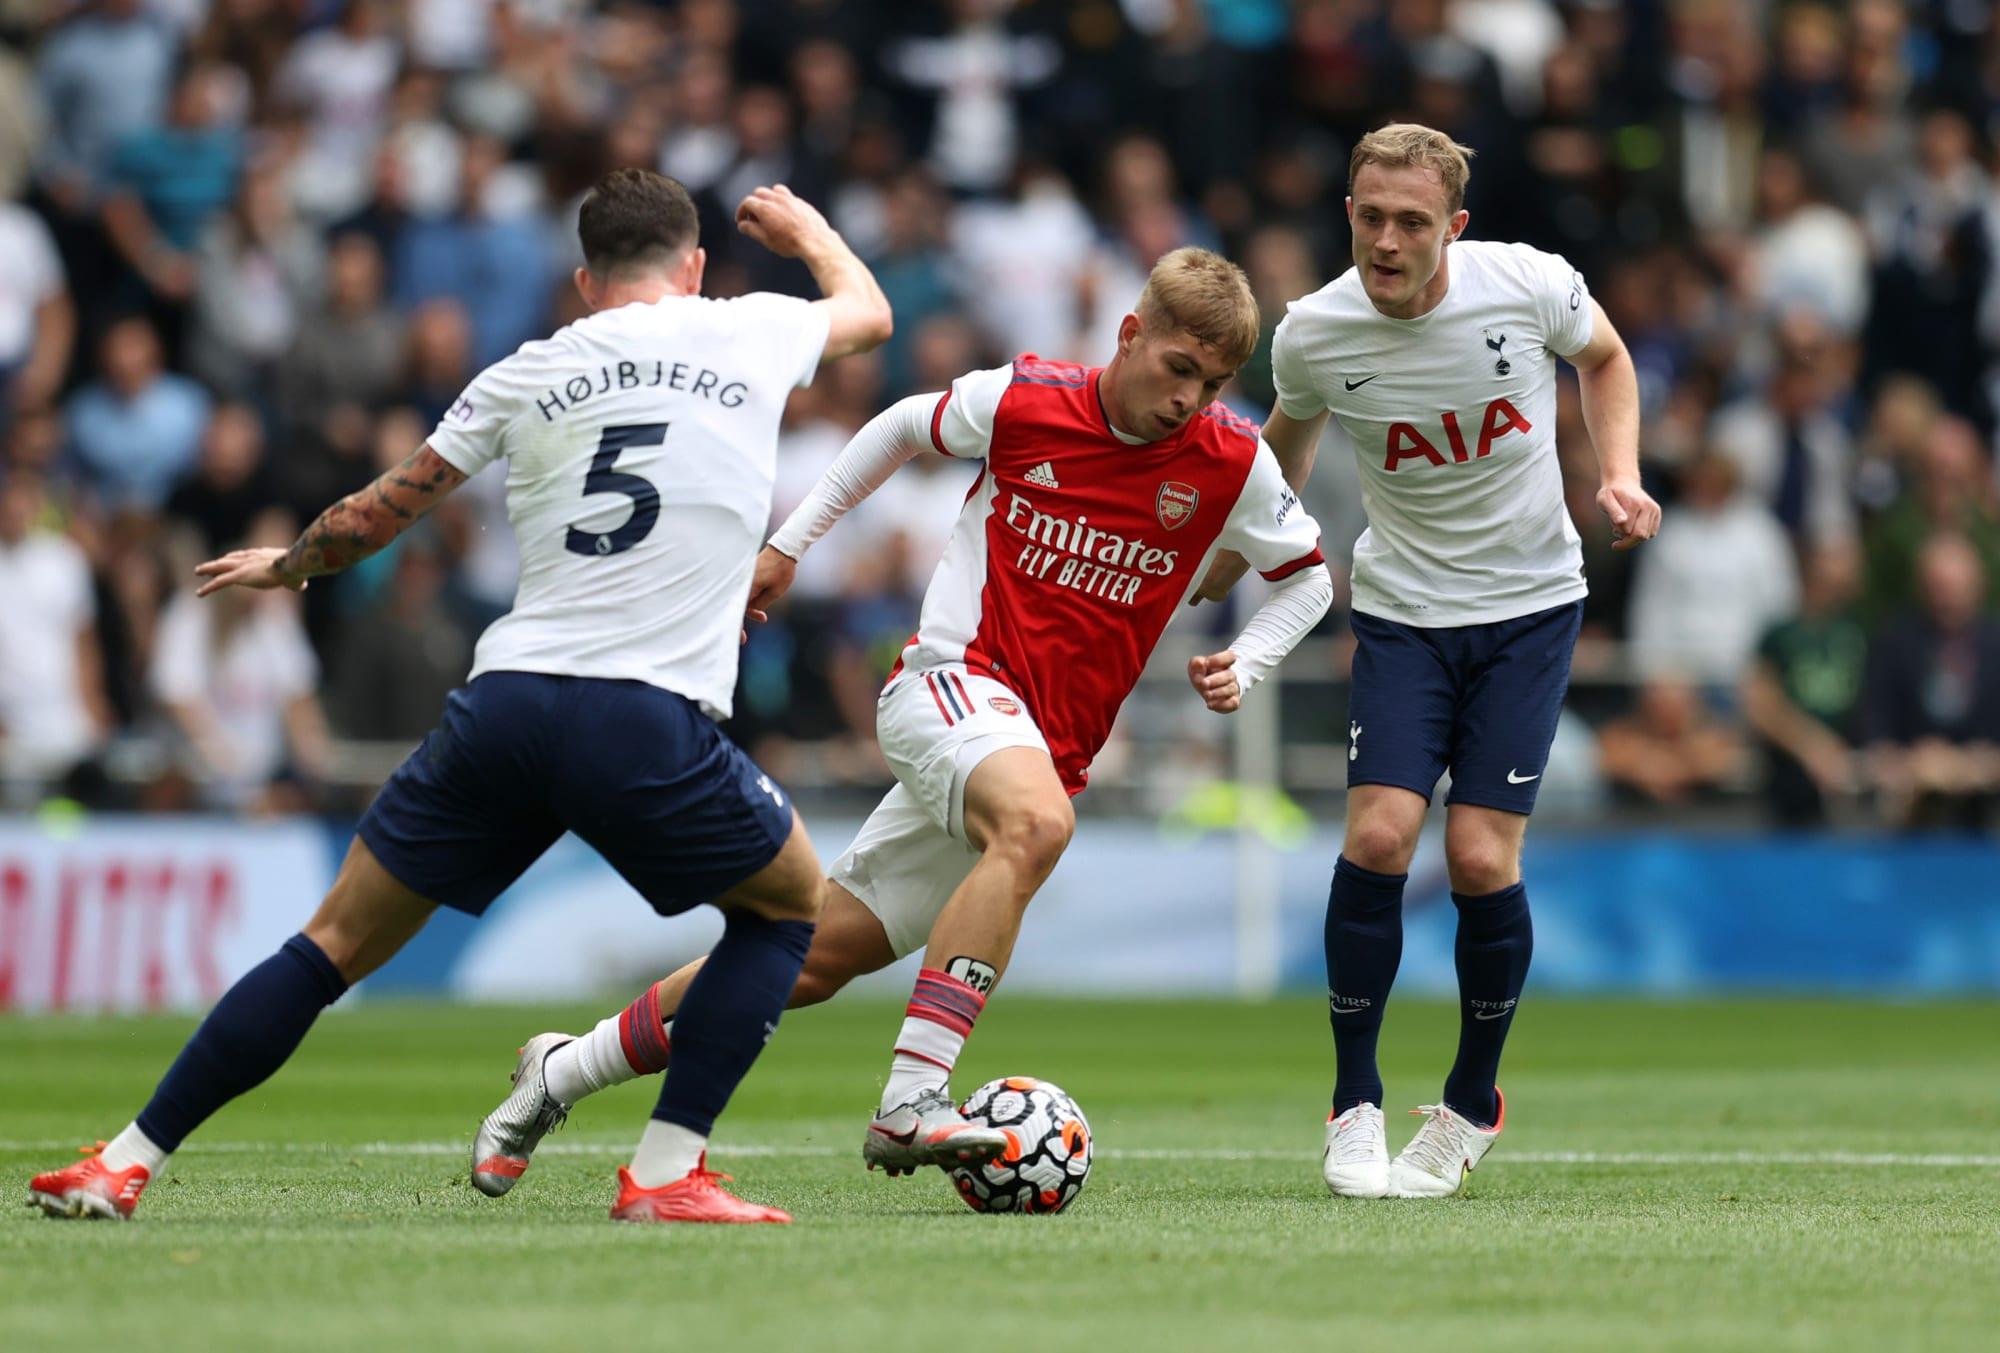 Arsenal predicted lineup vs Norwich: 4-2-3-1 with Tomiyasu?